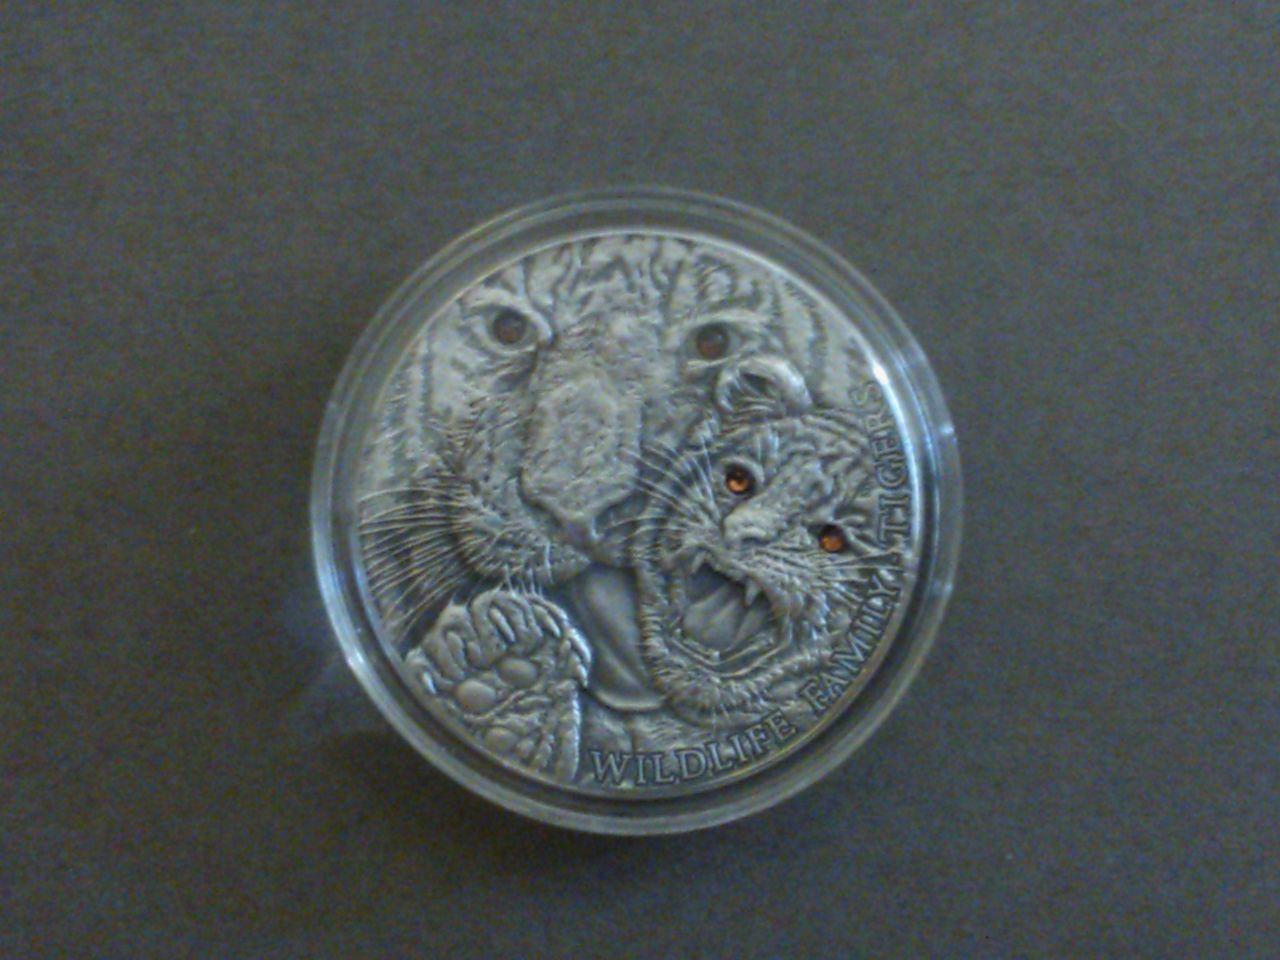 Tigers Wildlife Family Panthera Tigris Silver Coin 1$ 1 Oz Niue 2013 WP_000584